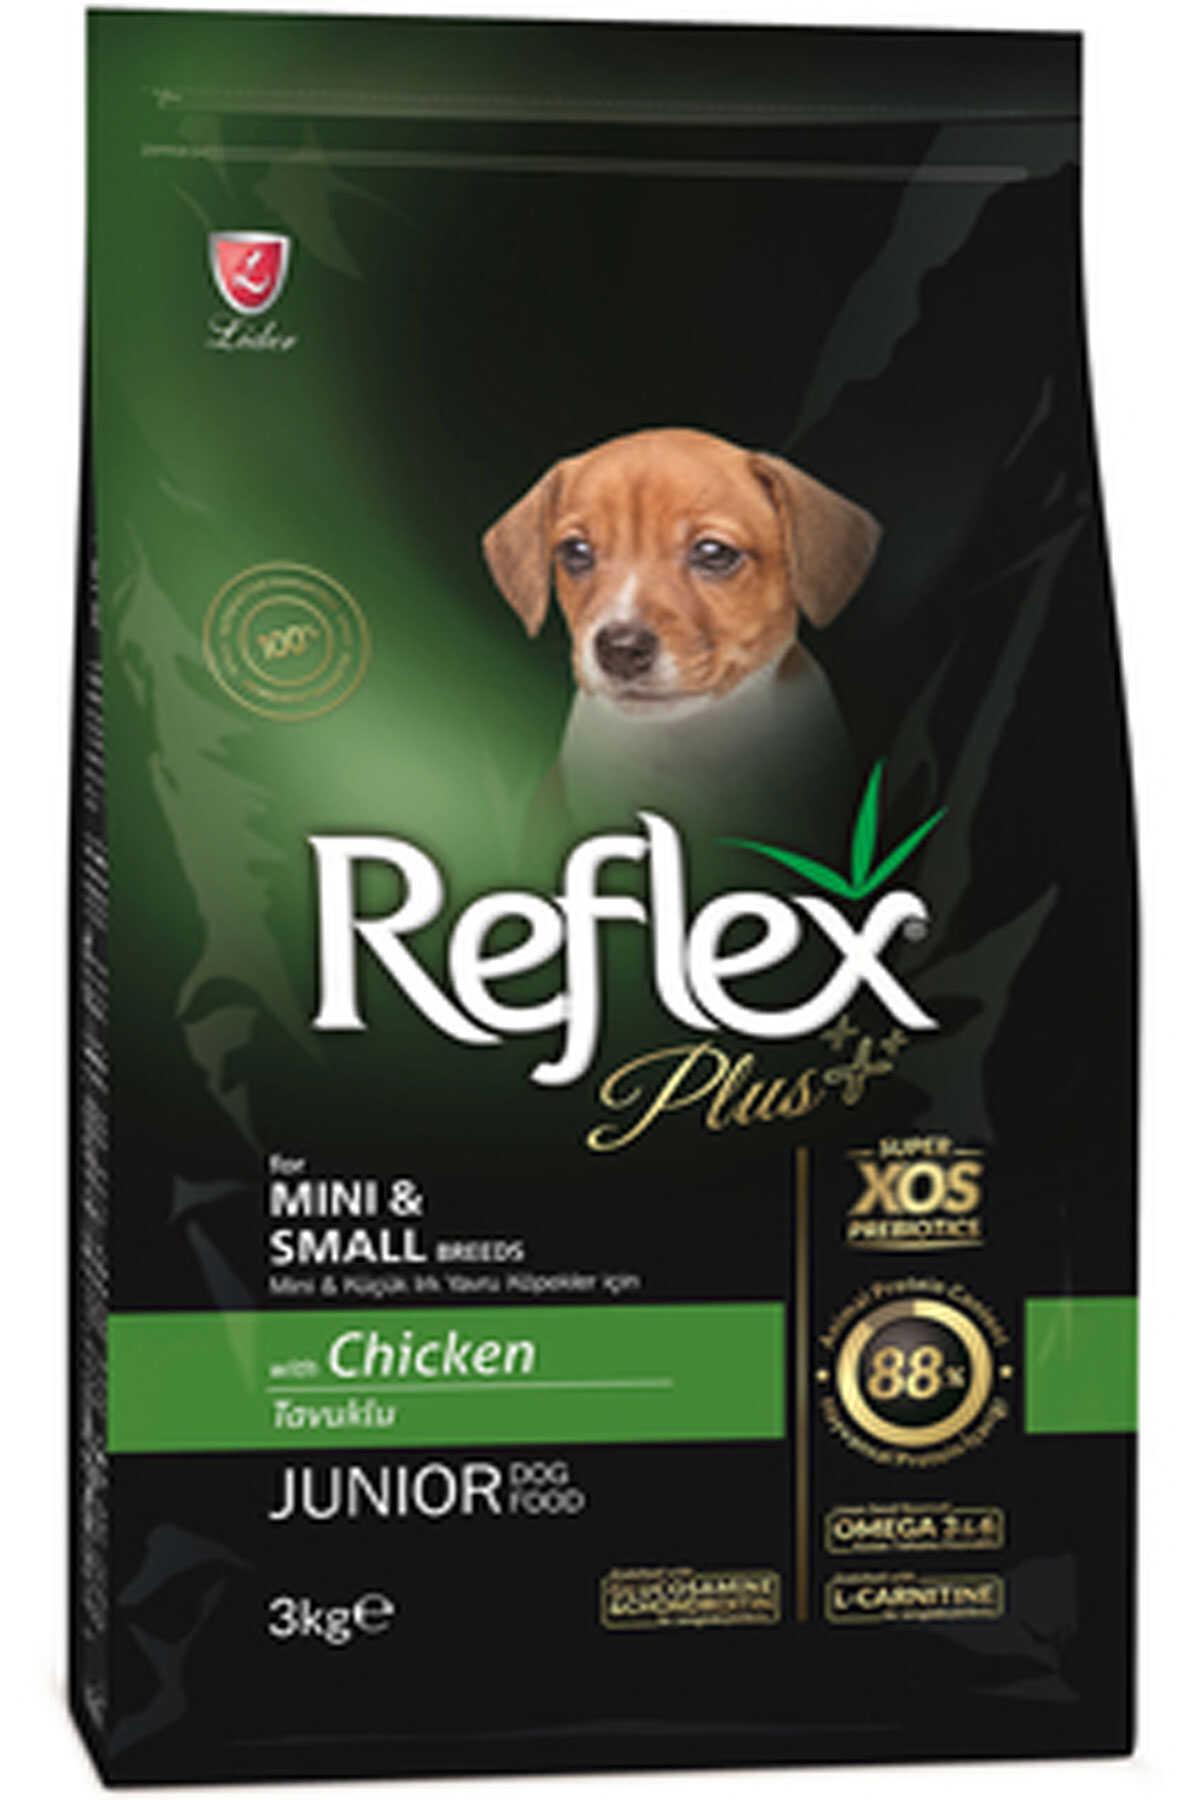 Reflex Plus Tavuklu Mini ve Küçük Irk Yavru Köpek Maması 3kg